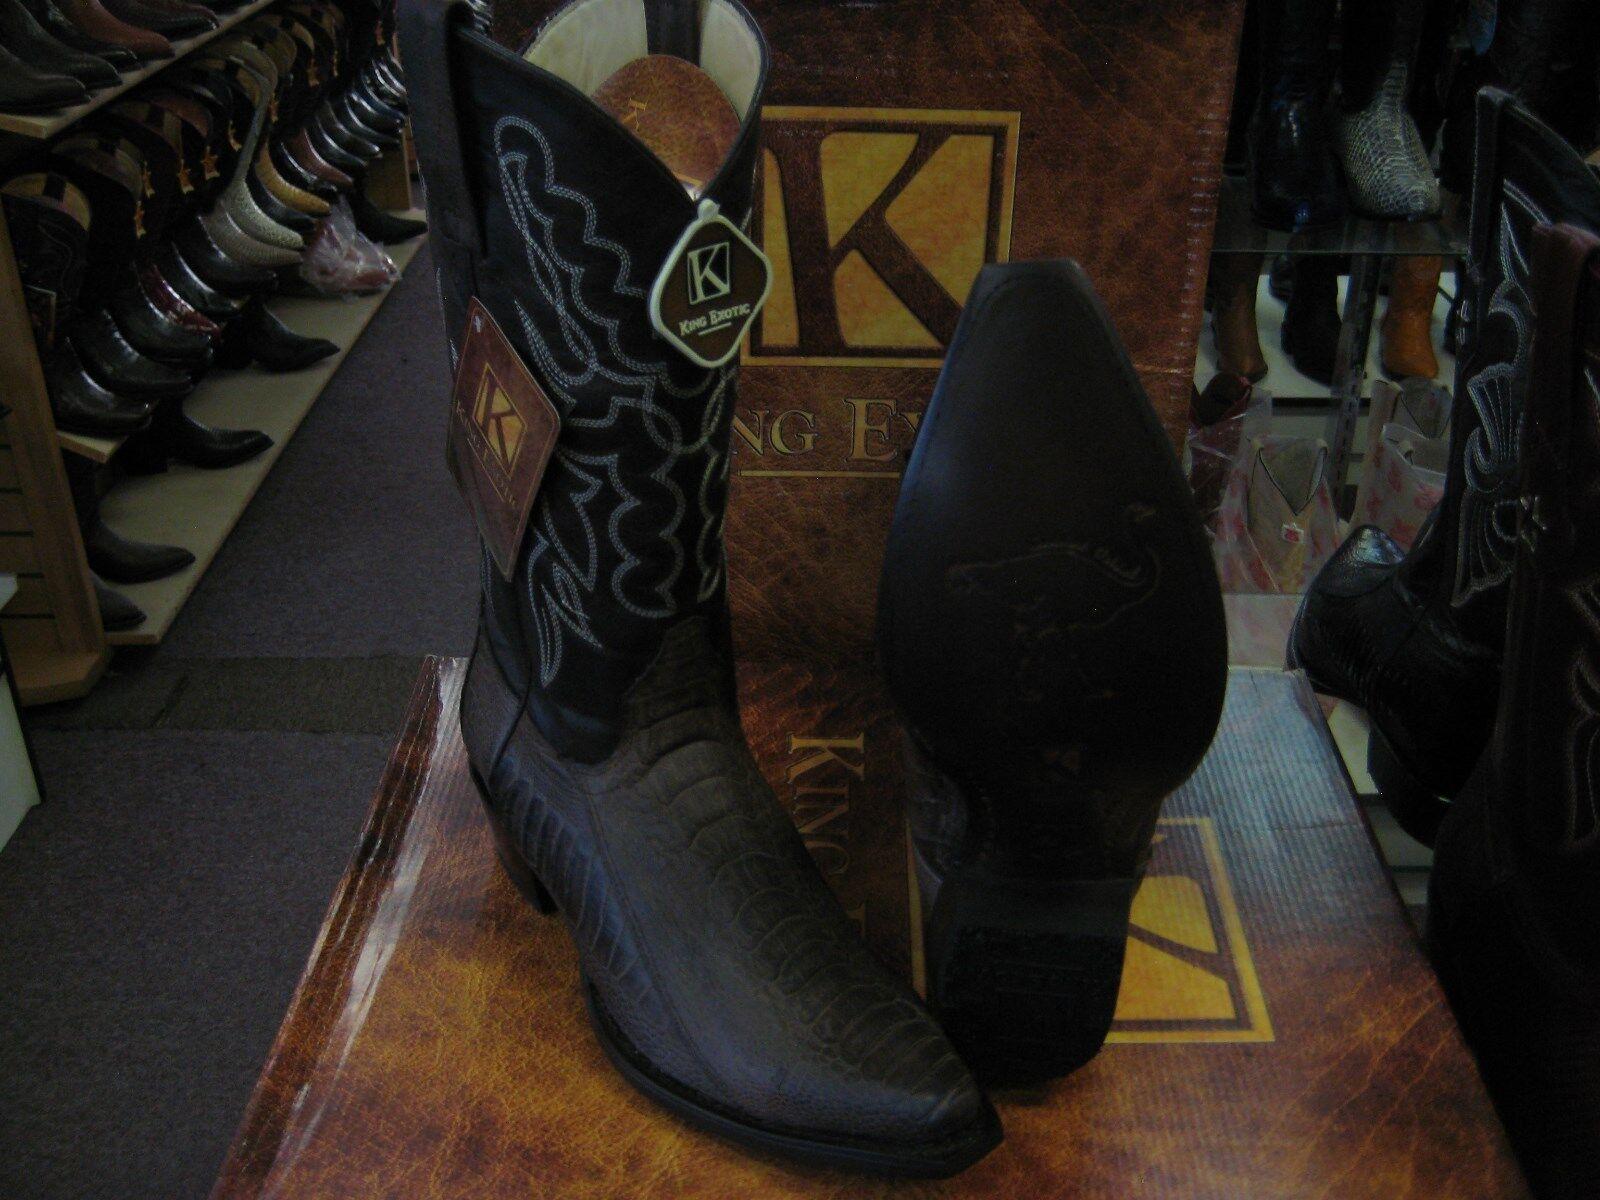 KING EXOTIC BROWN SNIP TOE GENUINE OSTRICH LEG WESTERN COWBOY BOOT EE 94G0507